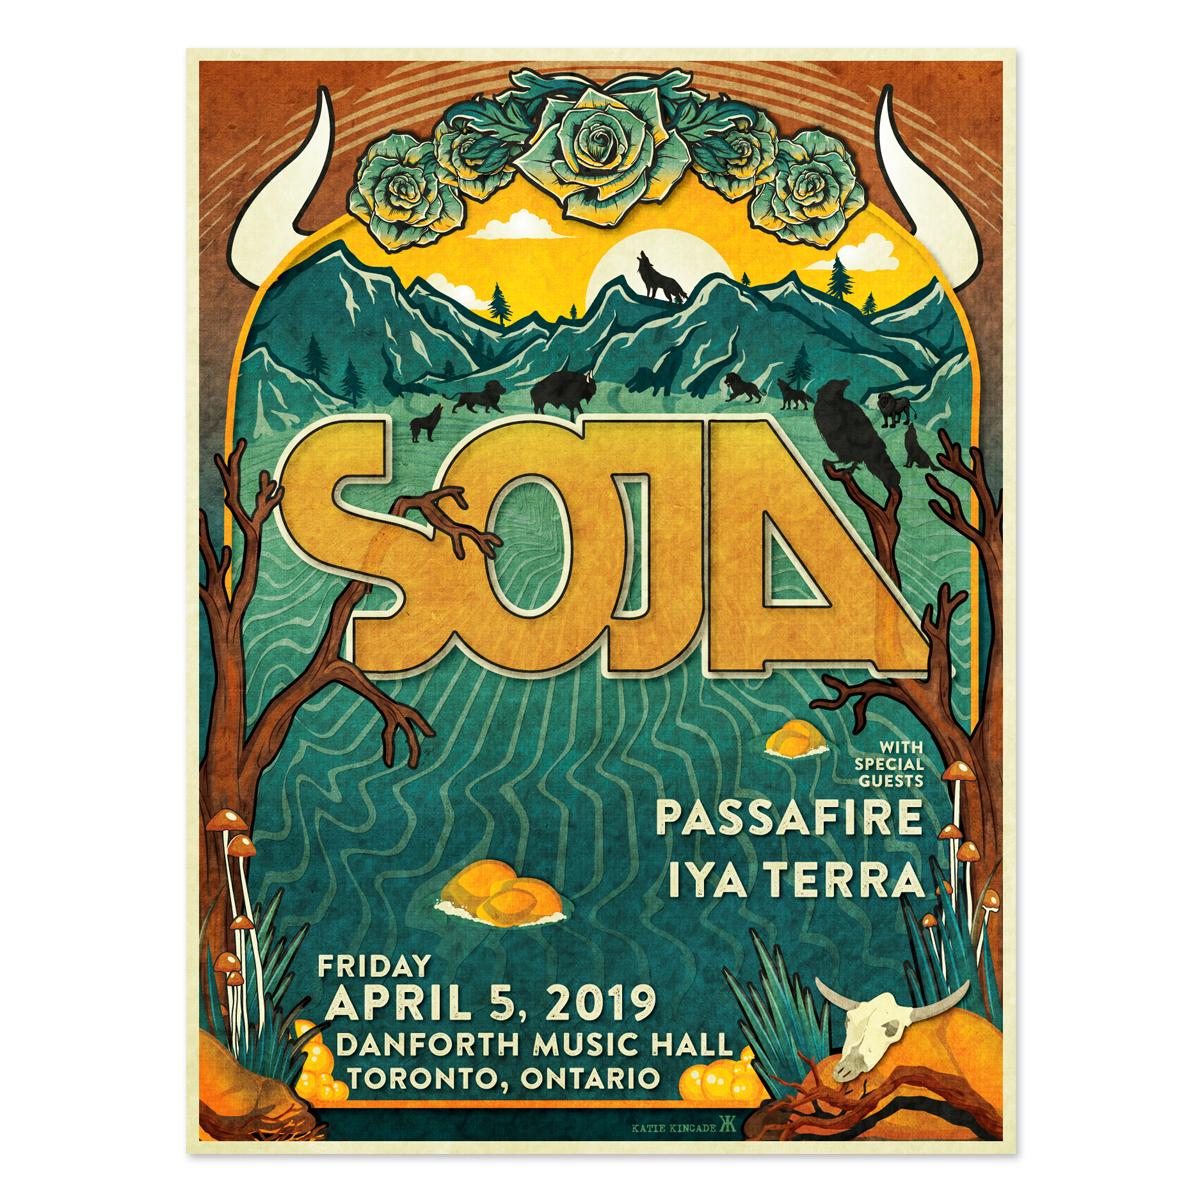 April 5 - Danforth Music Hall - Toronto, ON